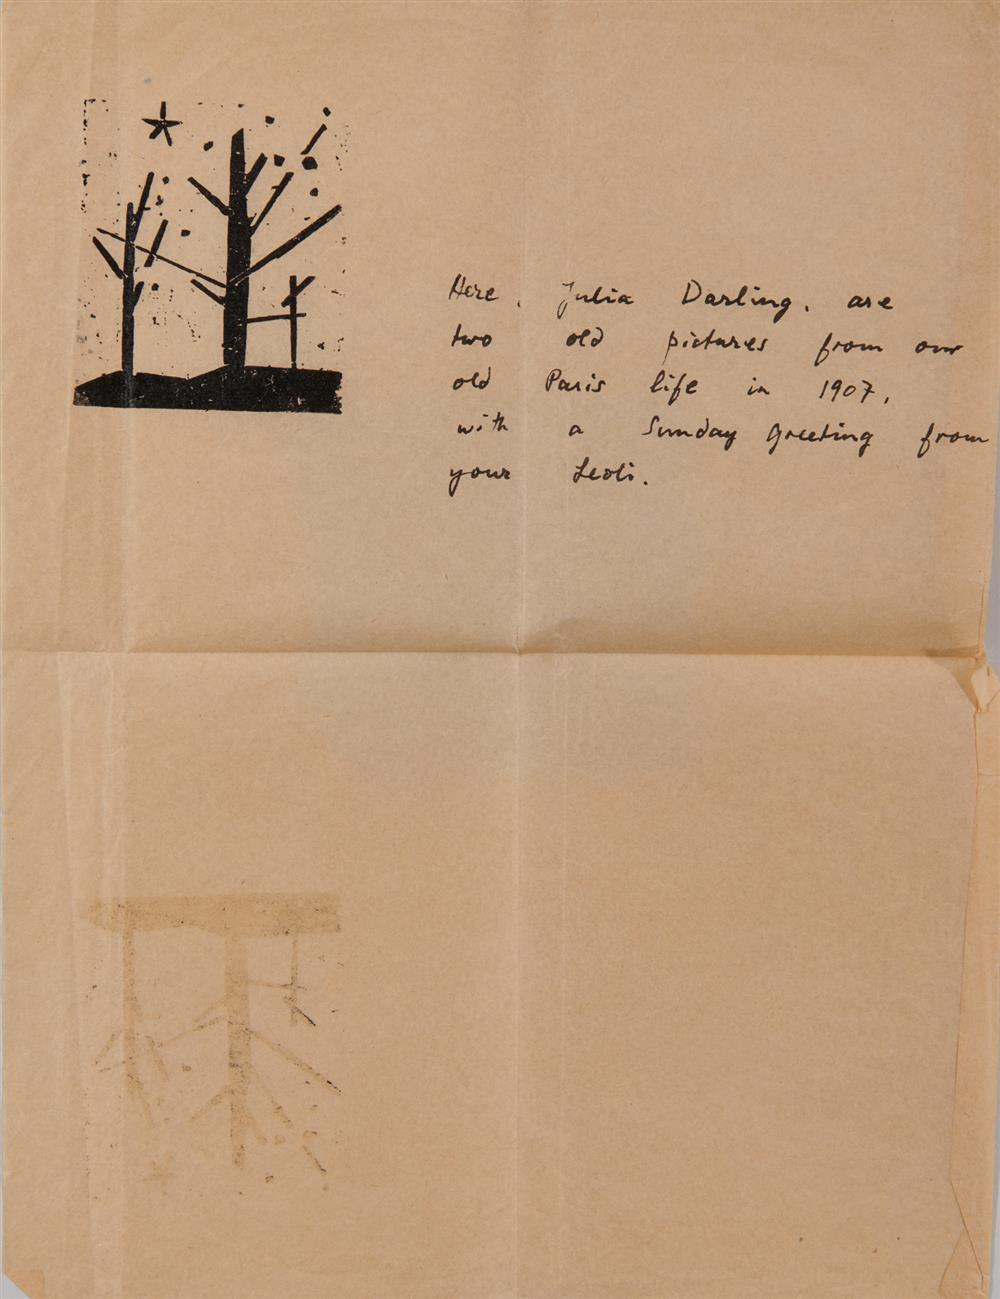 LYONEL FEINNGER, (American/German, 1871-1956), Baume und Stern (Trees and Star) [Prasse W260(64II)], woodcut, 2 1/2 x 2 1/4 in.